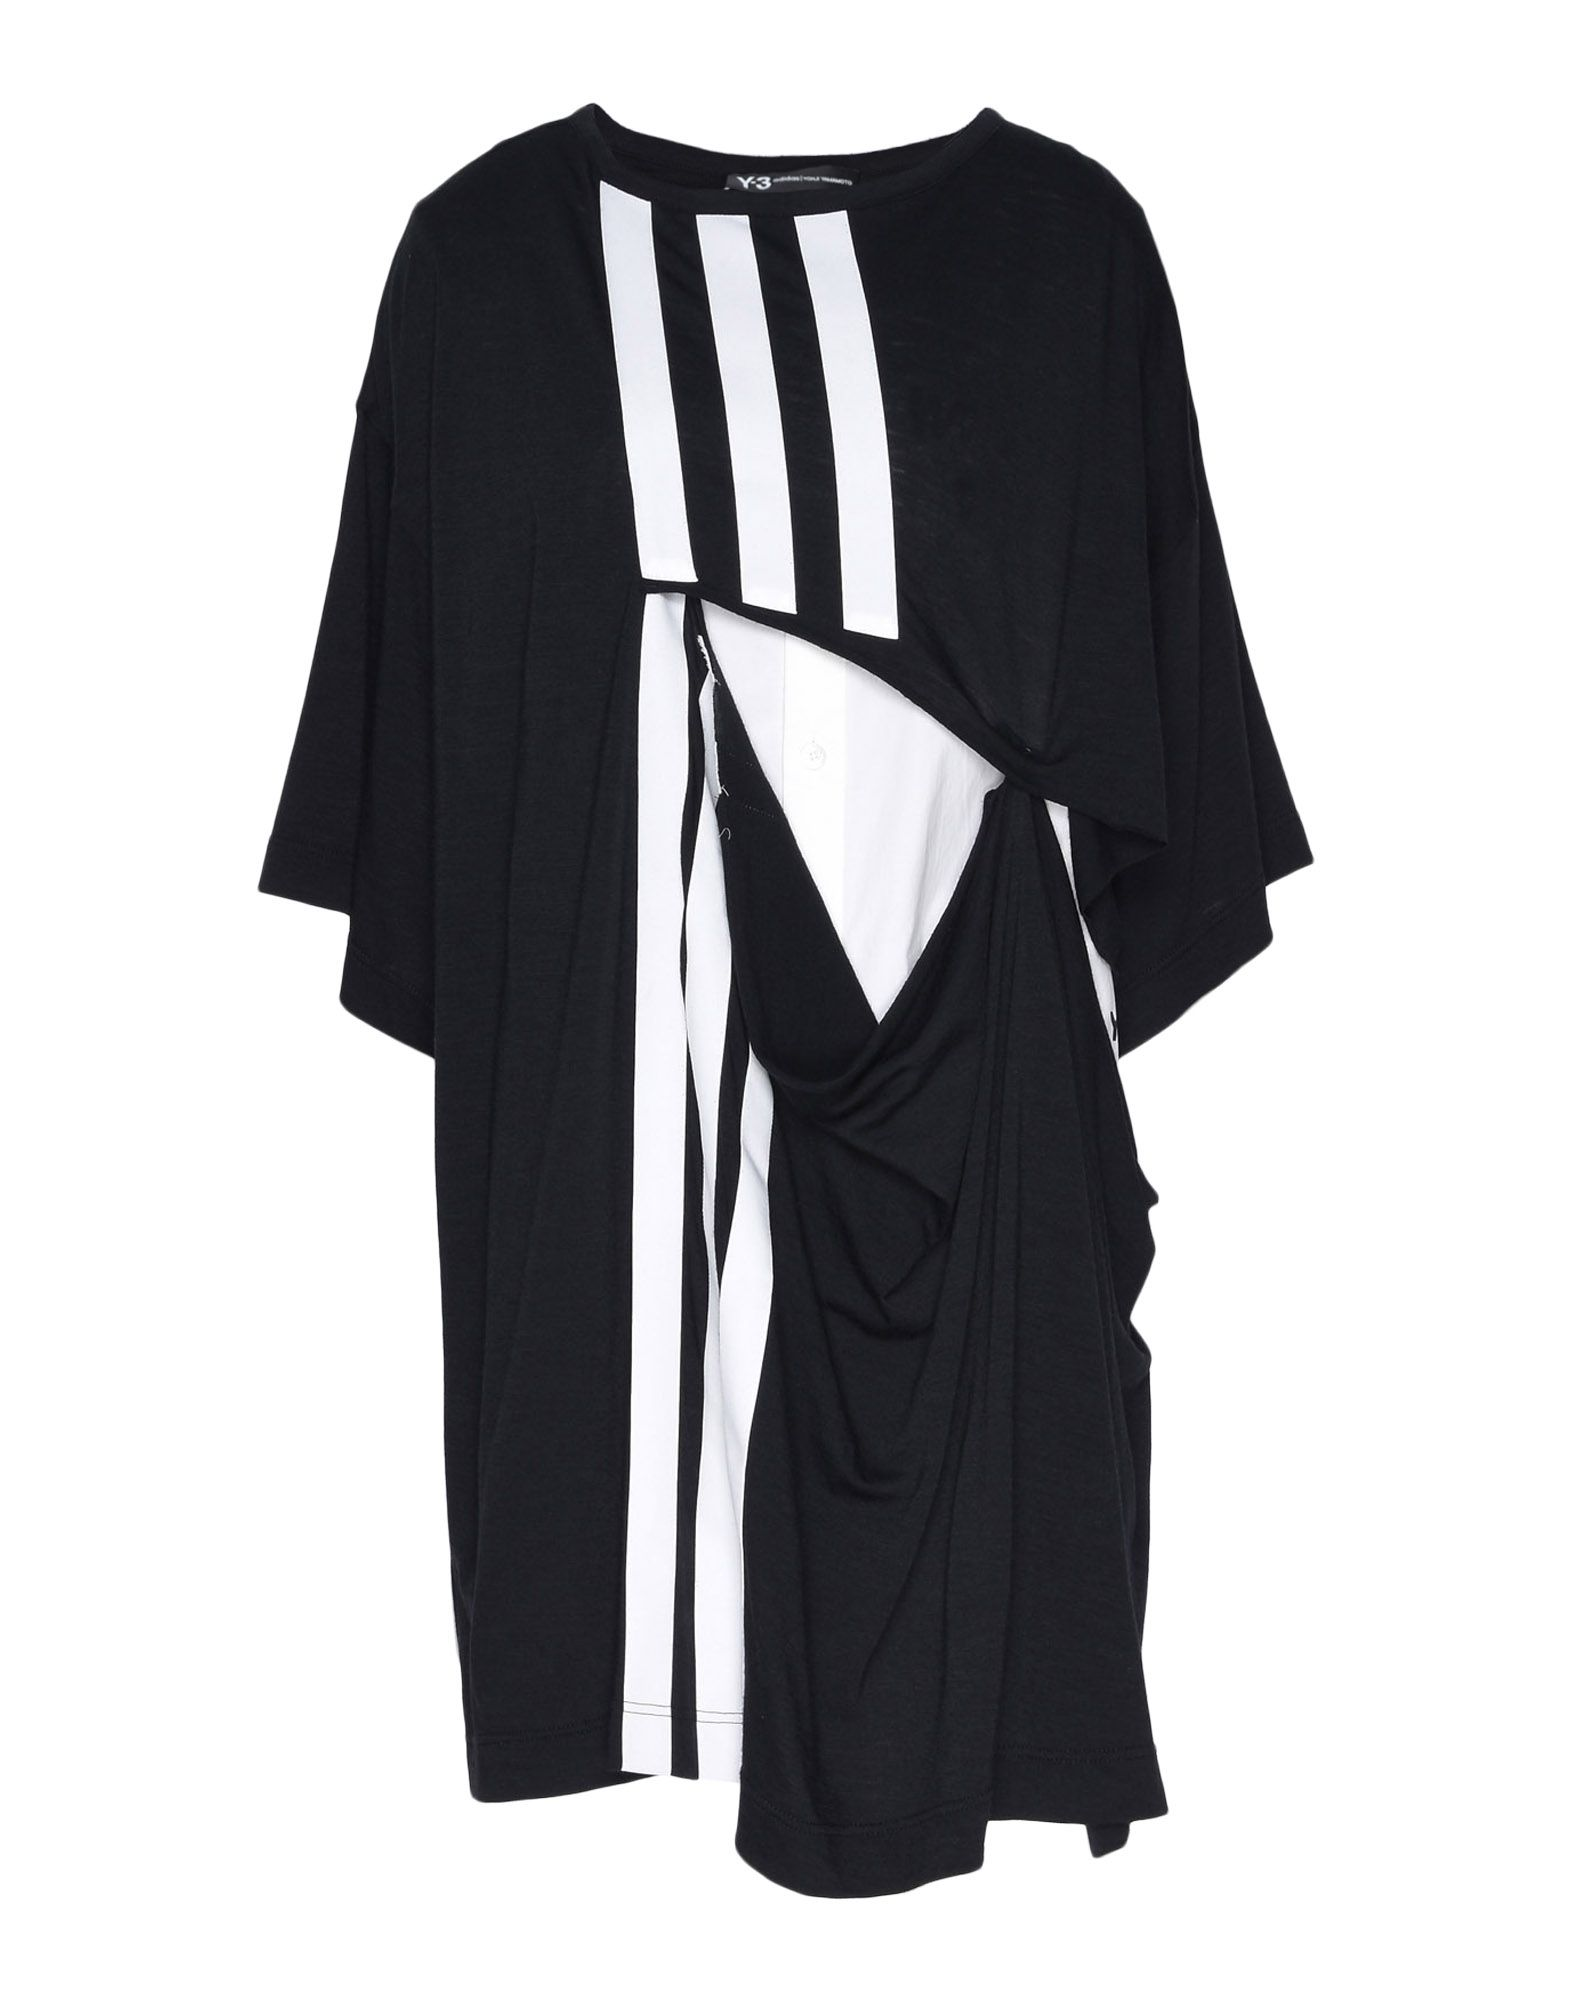 Y-3 Y-3 3-Stripes Layered Tee Short sleeve t-shirt Woman f